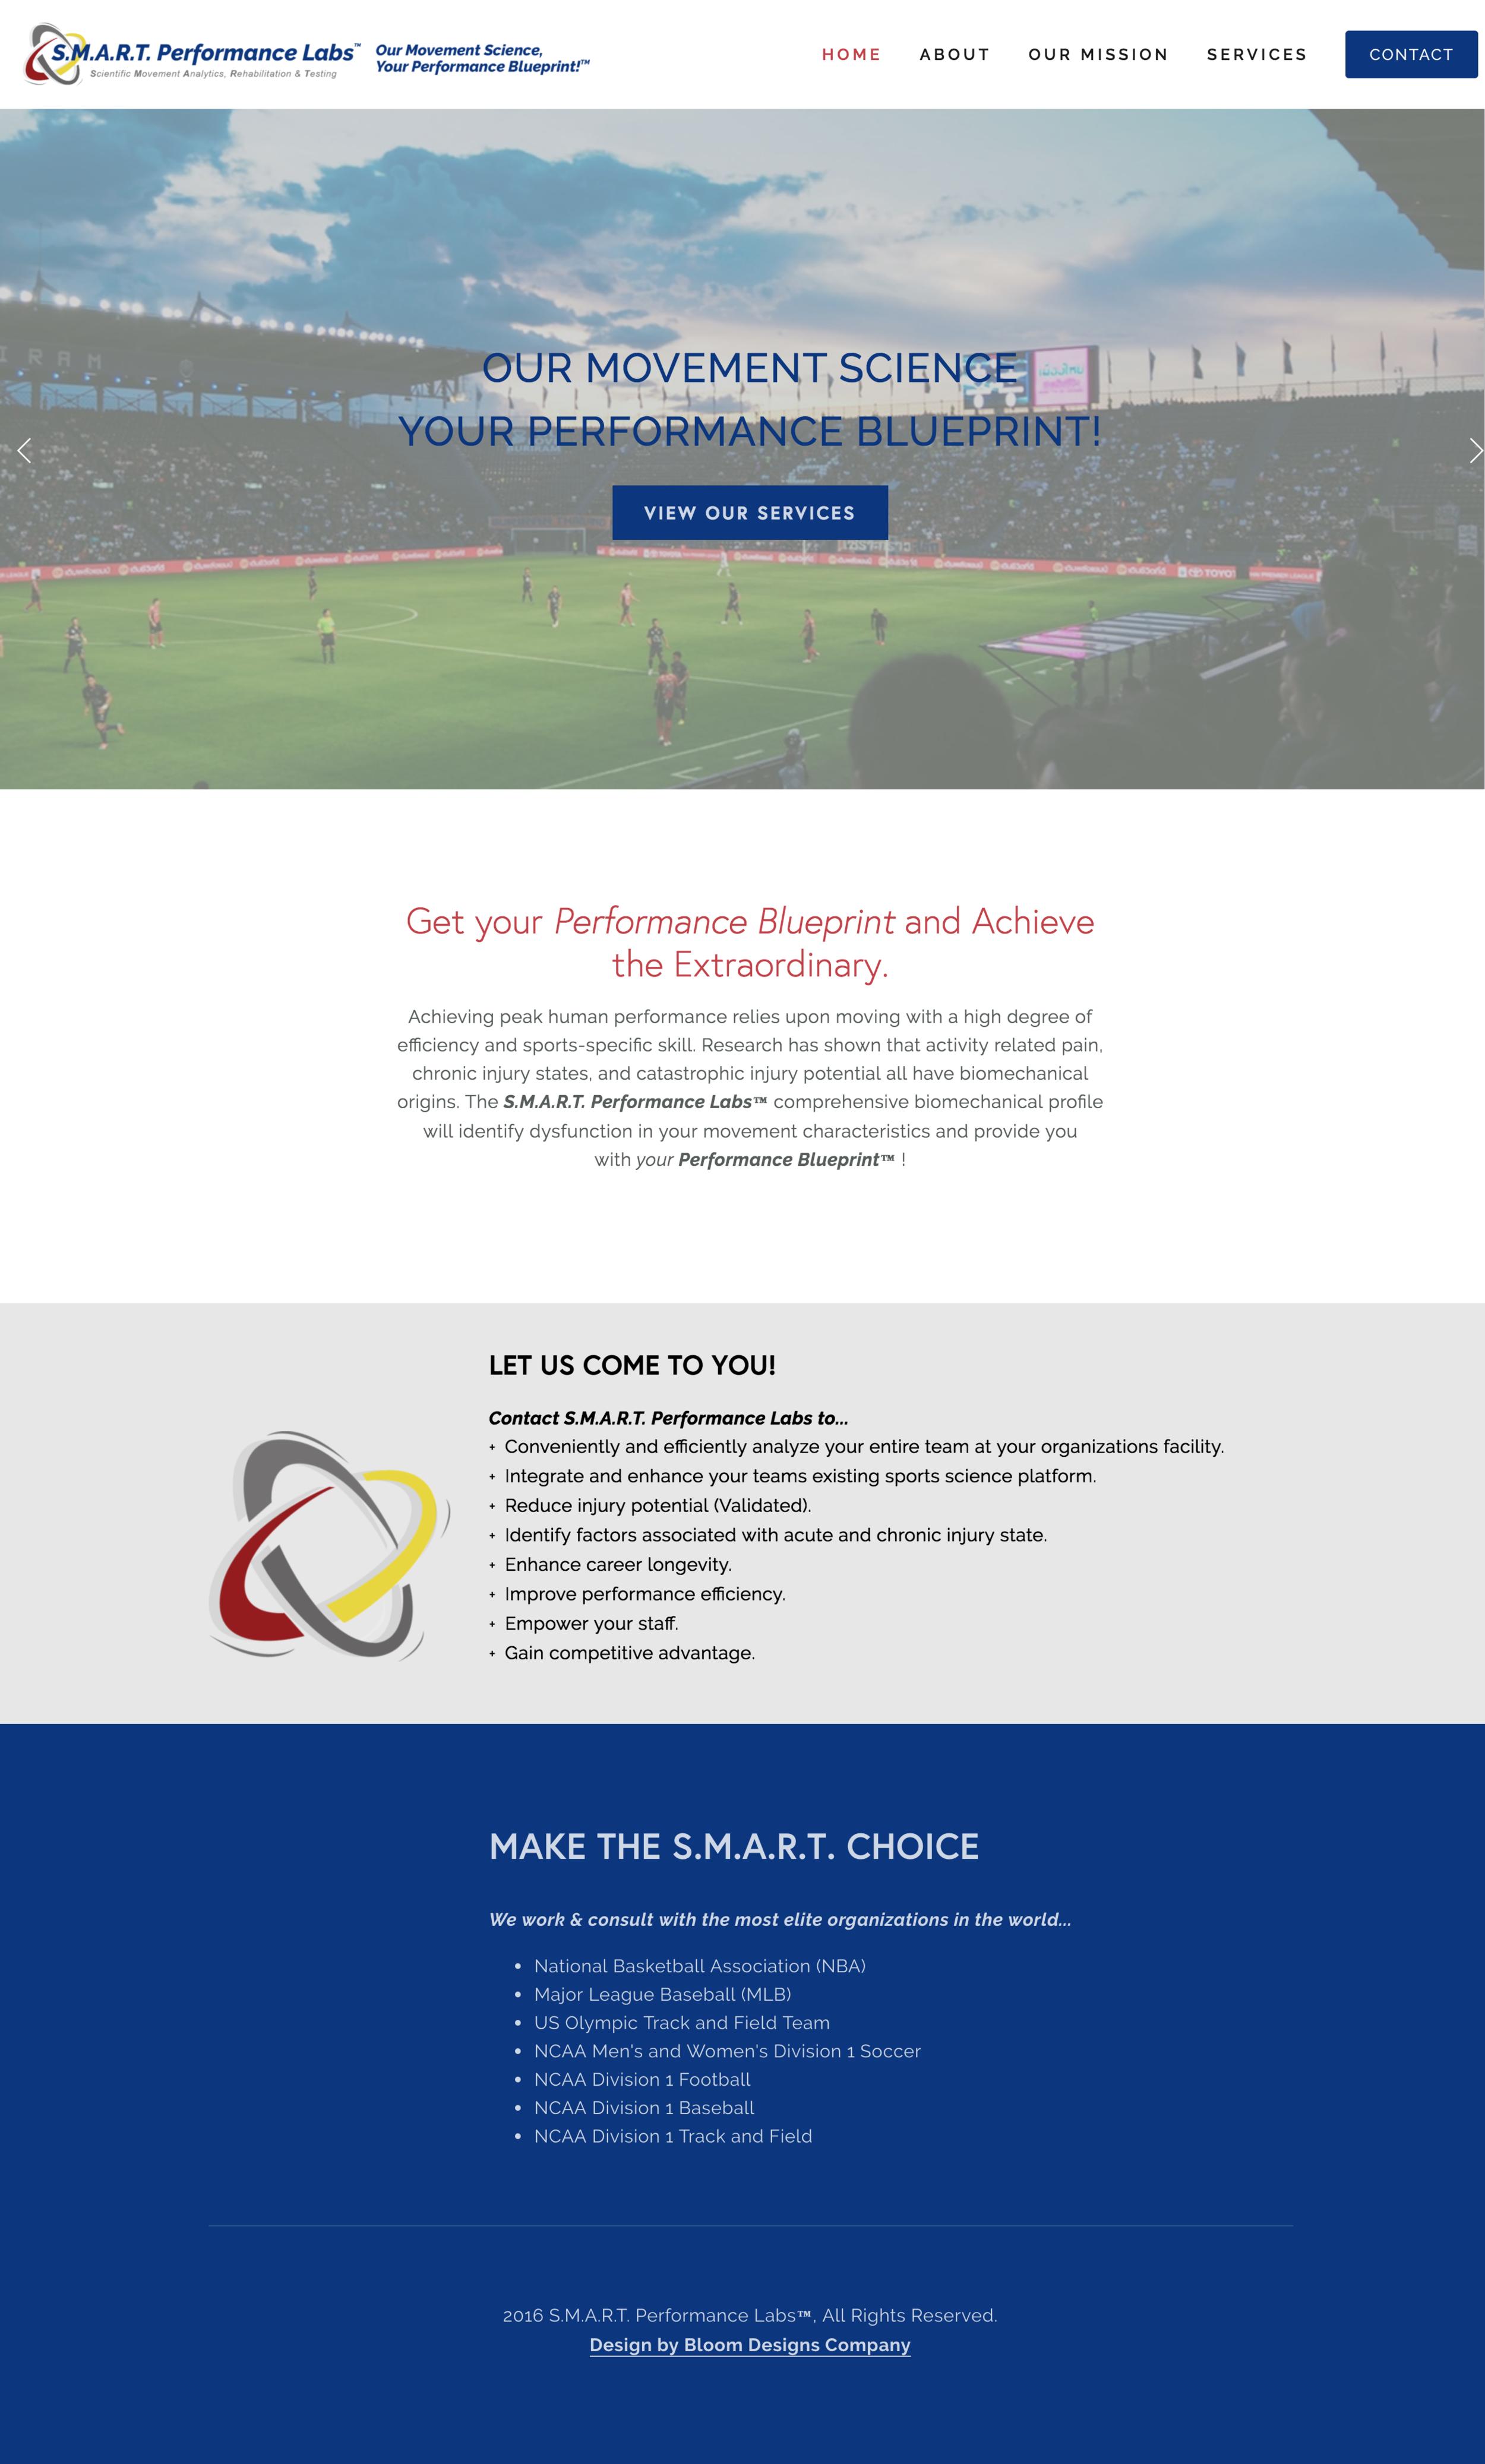 smart-performance-labs-website-design